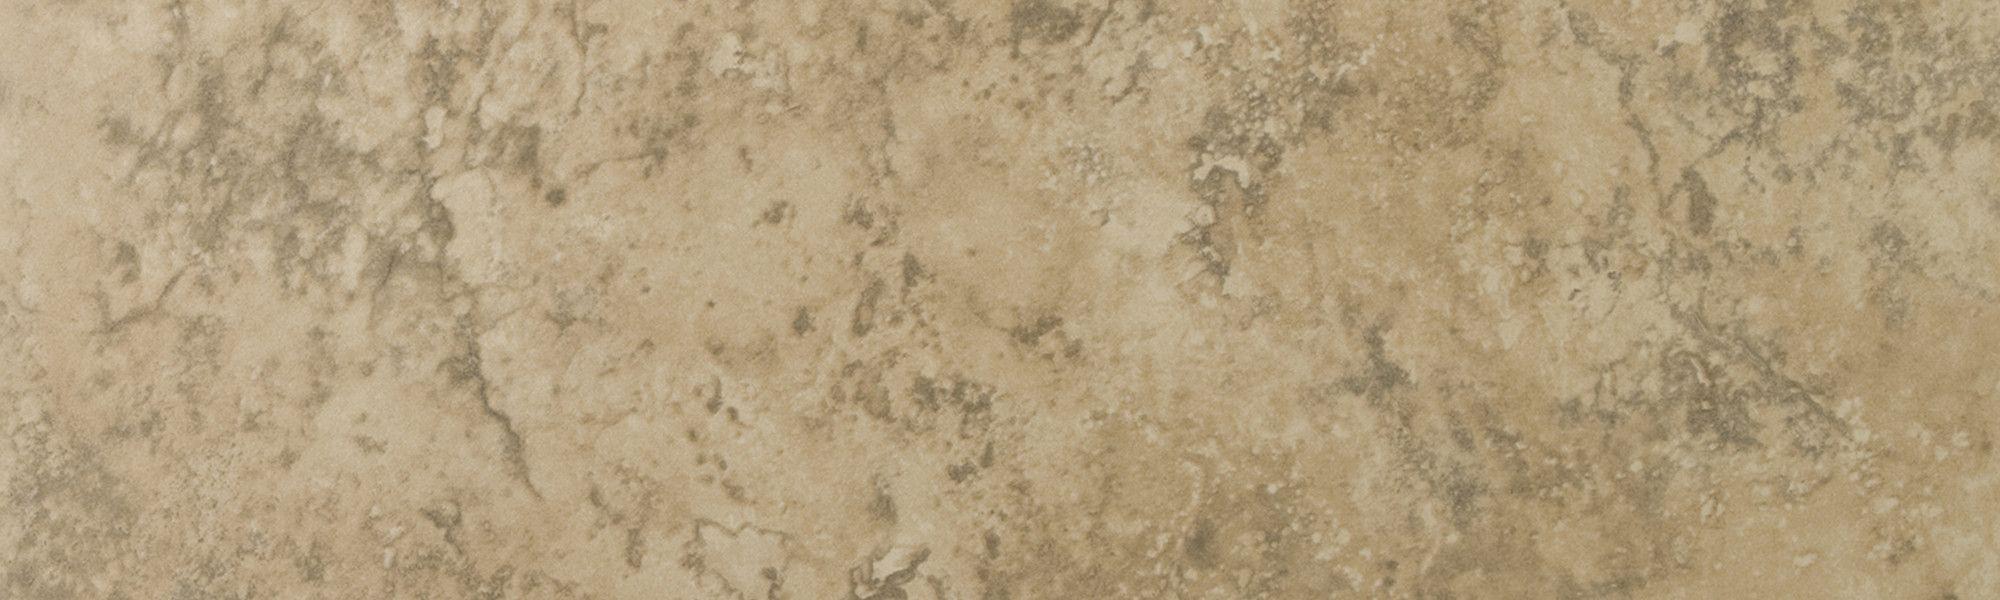 "Decorative Bullnose Tile Trim Stunning Eurasia 13"" X 3"" Bullnose Tile Trim In Cafe  Products  Pinterest Inspiration"